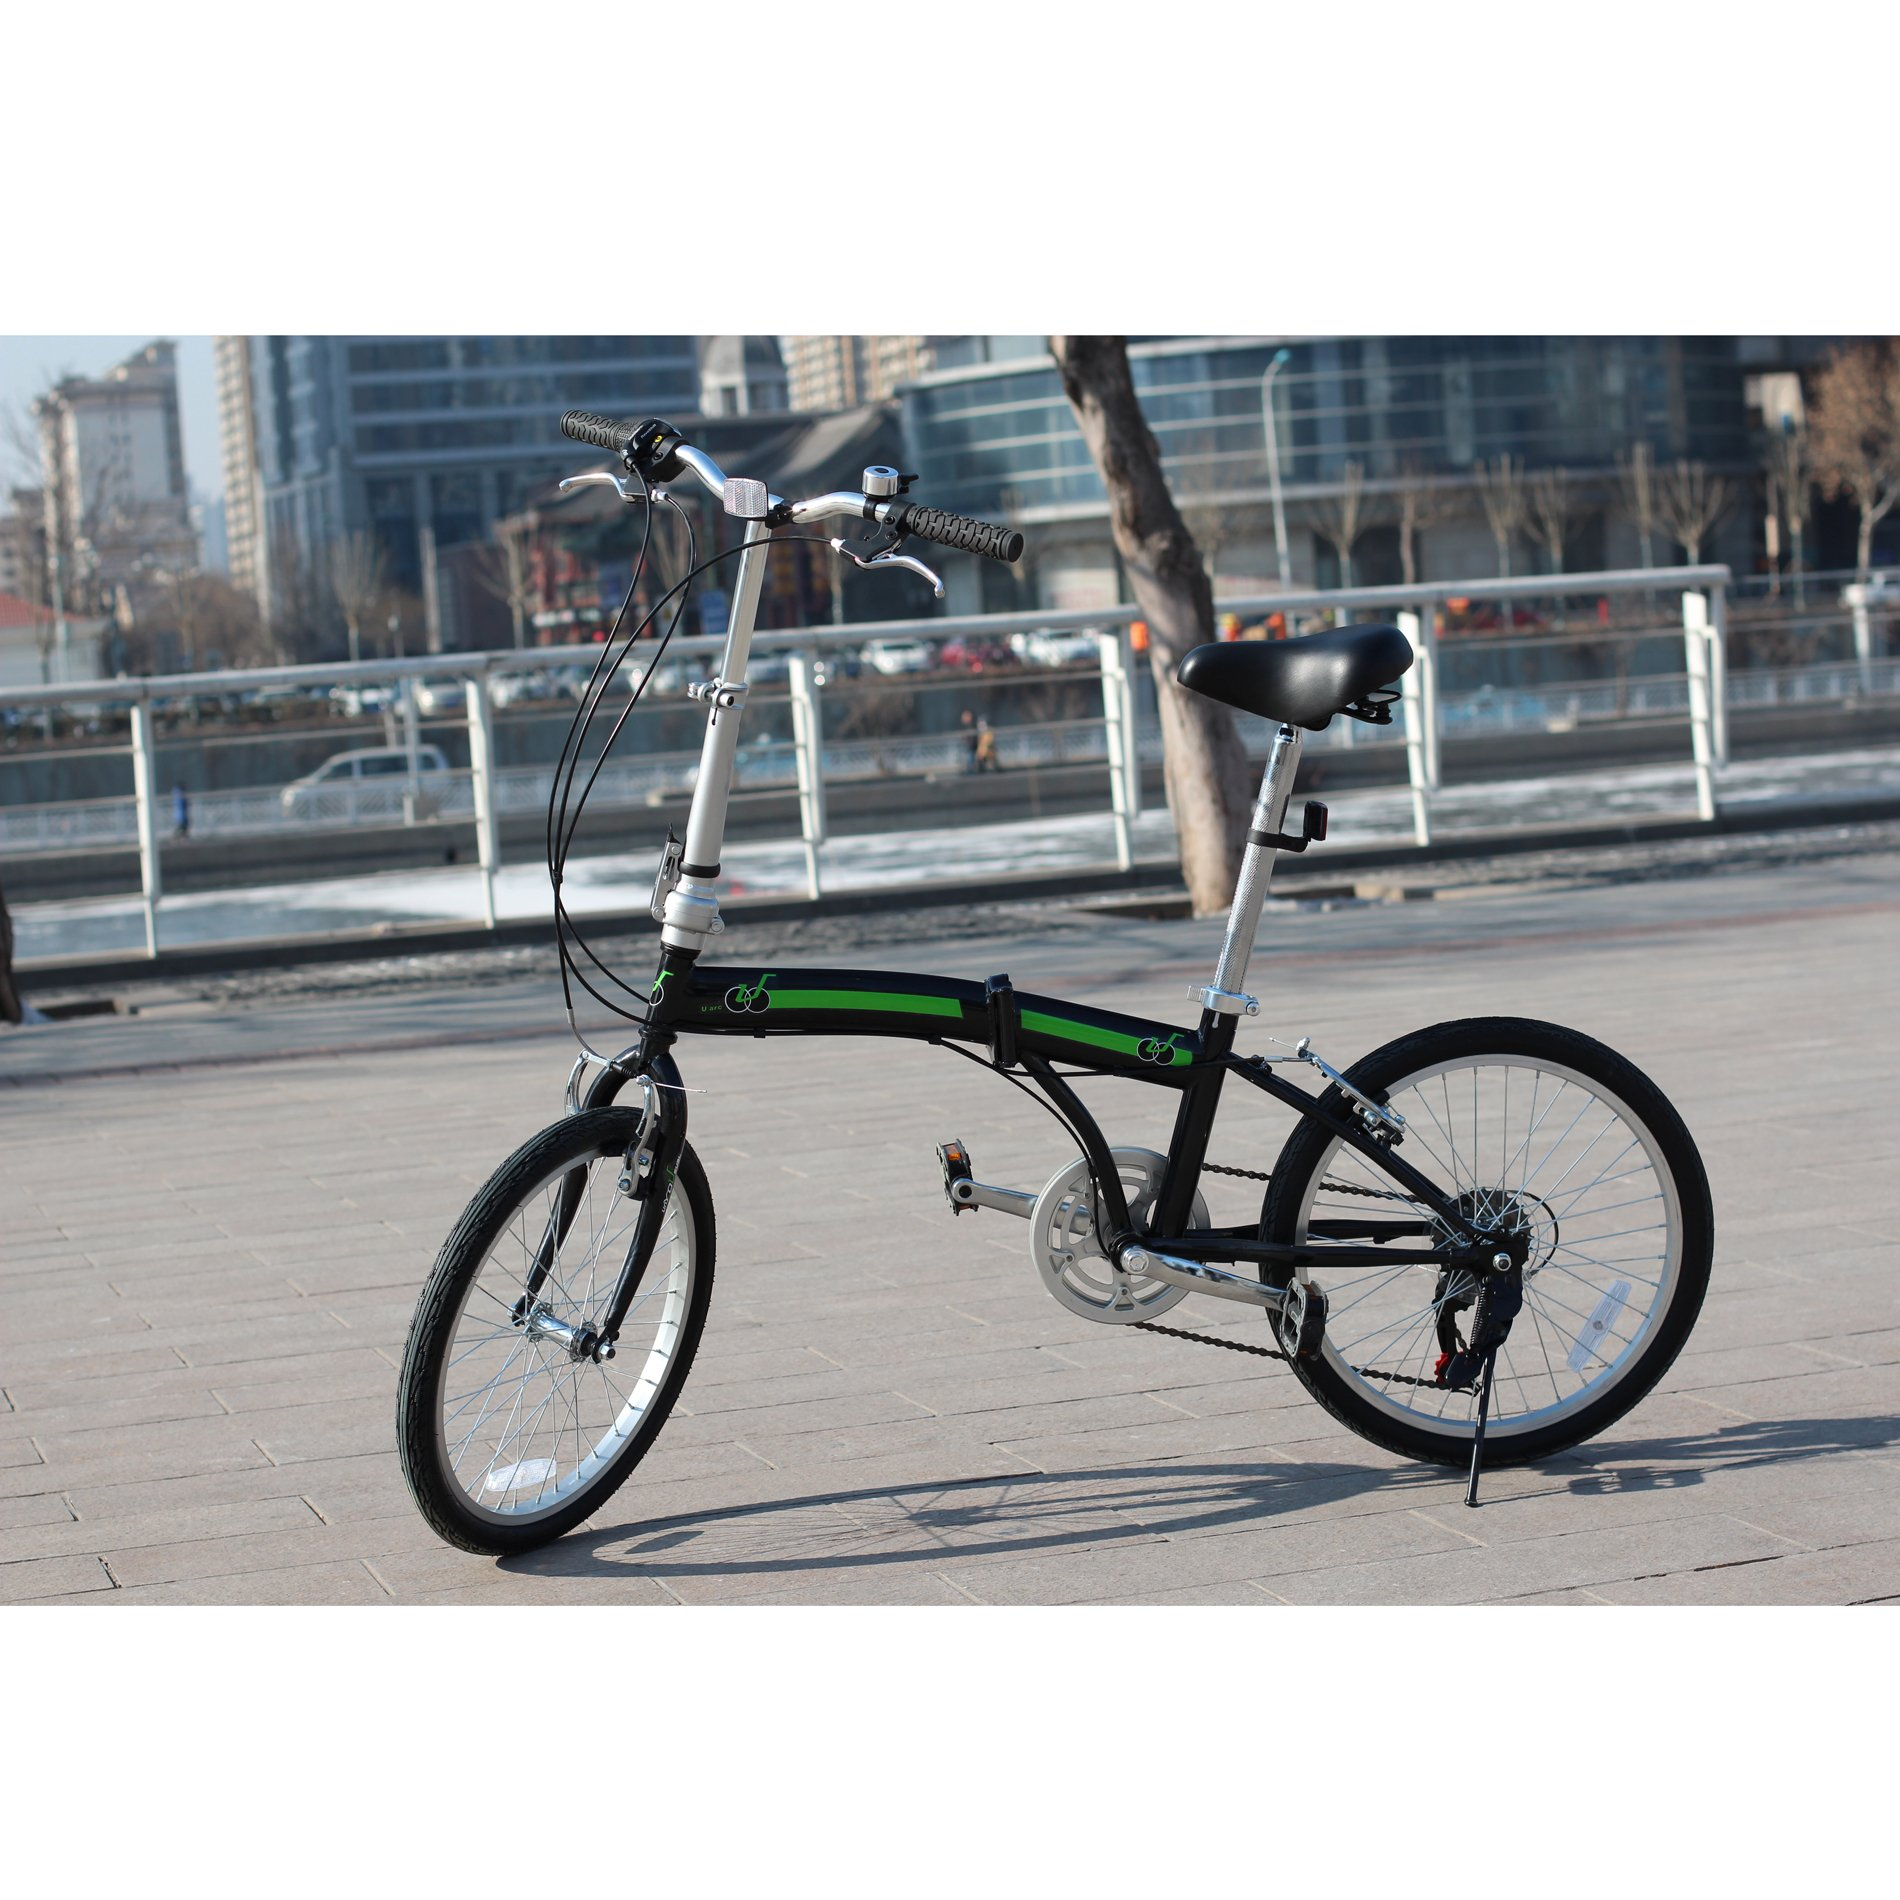 IDS Home Unyousual U Arc Folding City Bike Bicycle 6 Speed Steel Frame Shimano Gear Wanda Tire, Black by IDS Home (Image #3)